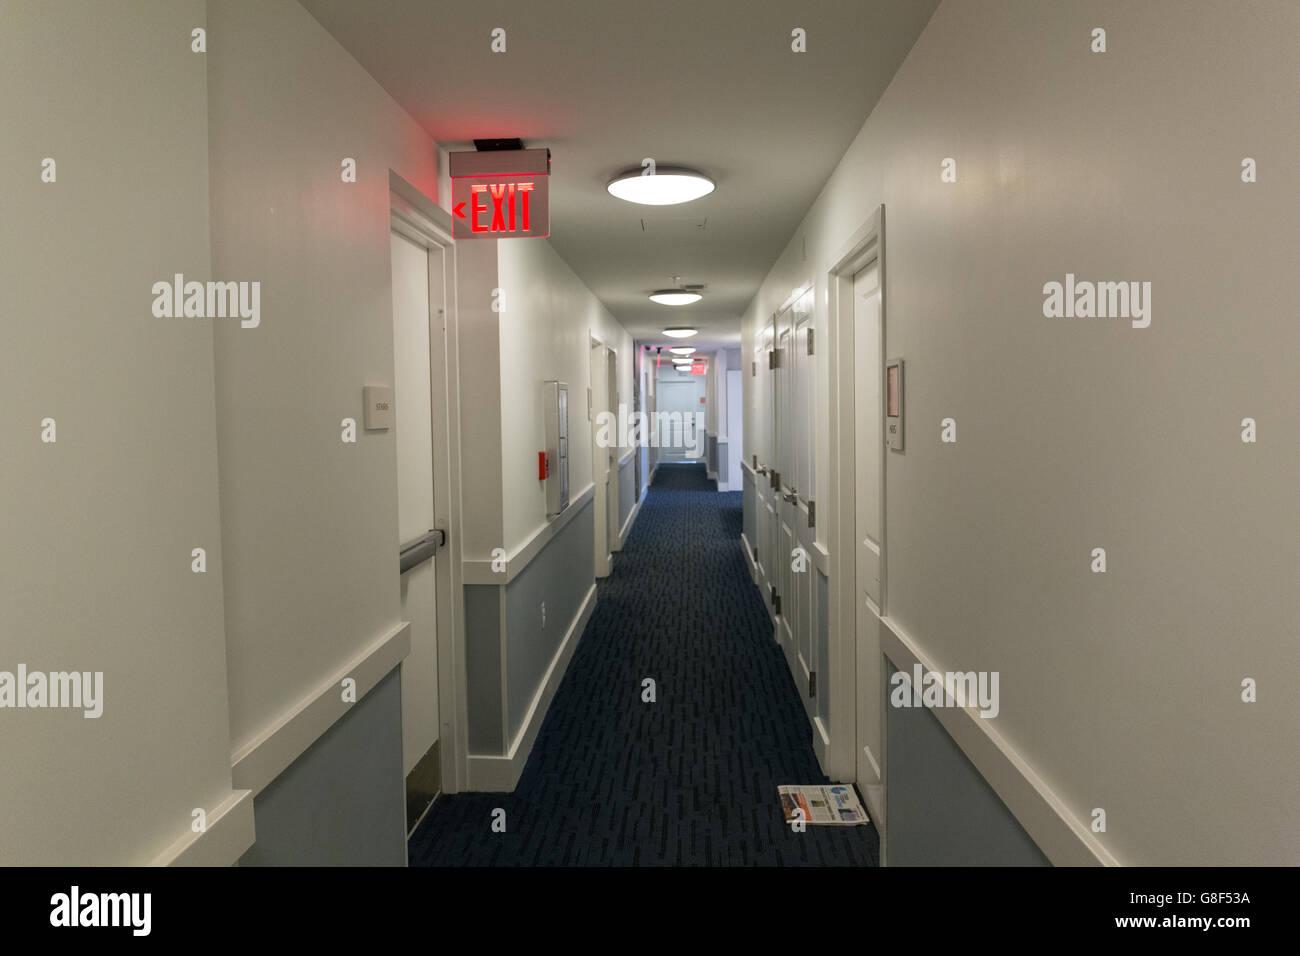 Hallway at the Hotel Indigo - Stock Image